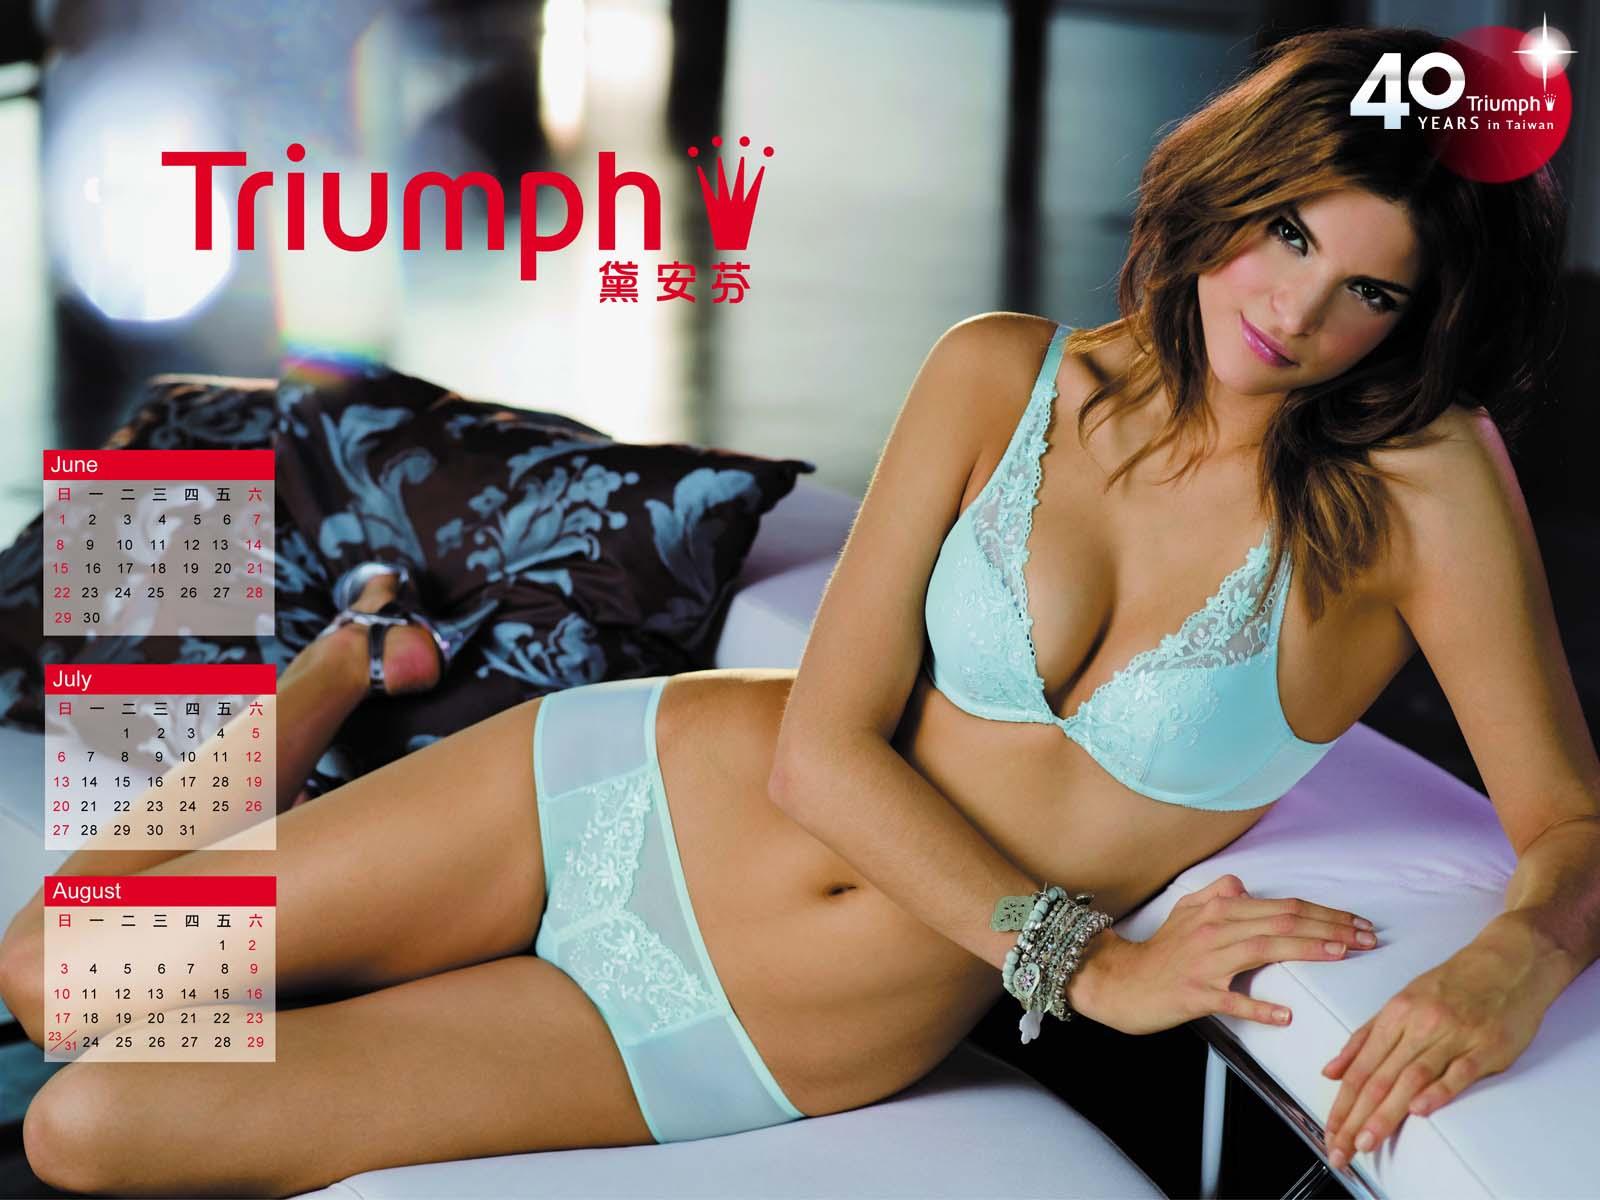 Triumph Bra Usa >> Lingerie Models: 04/12/11 - 11/12/11